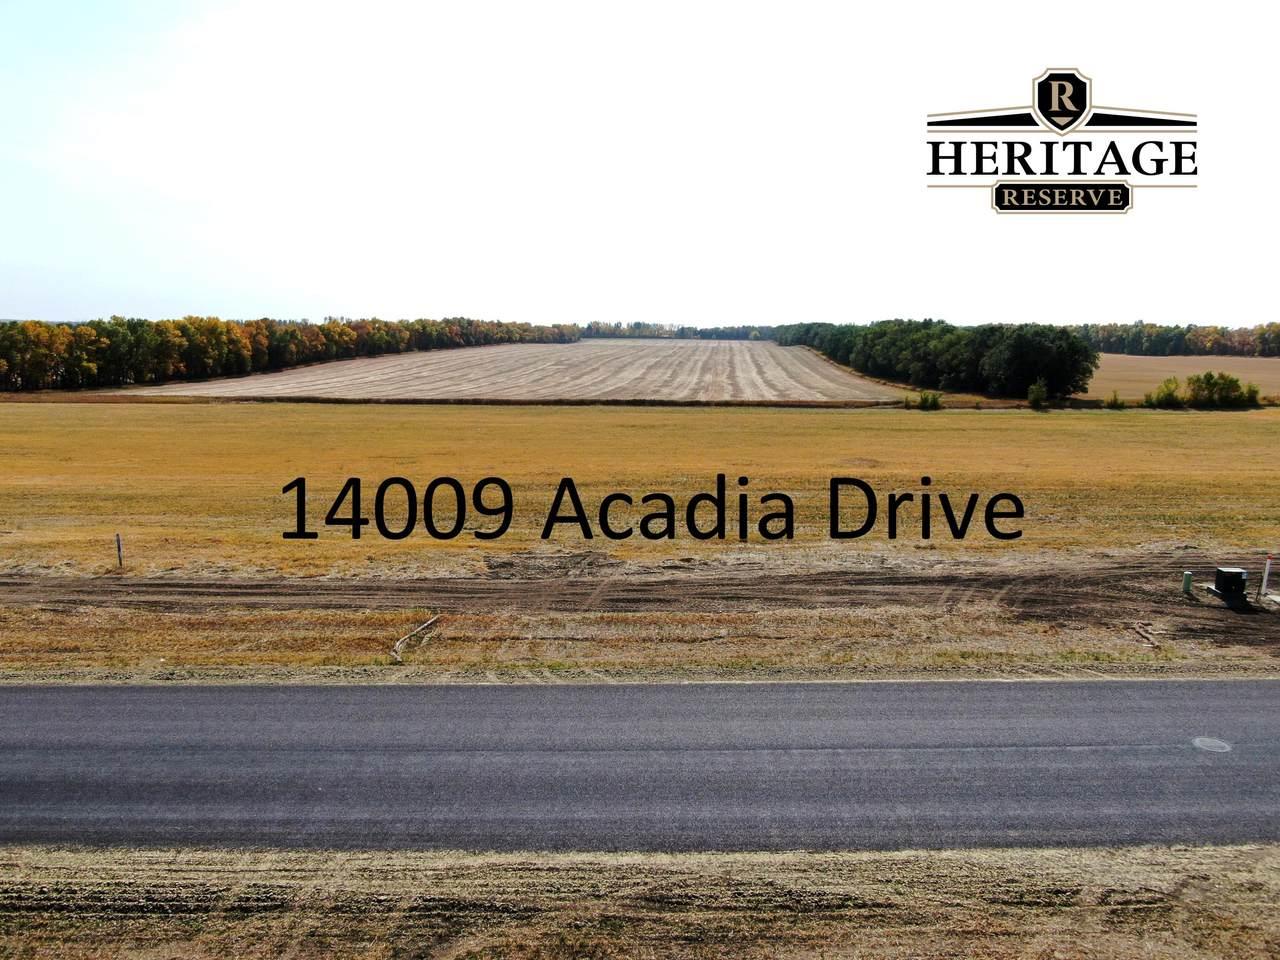 14009 Acadia Drive - Photo 1